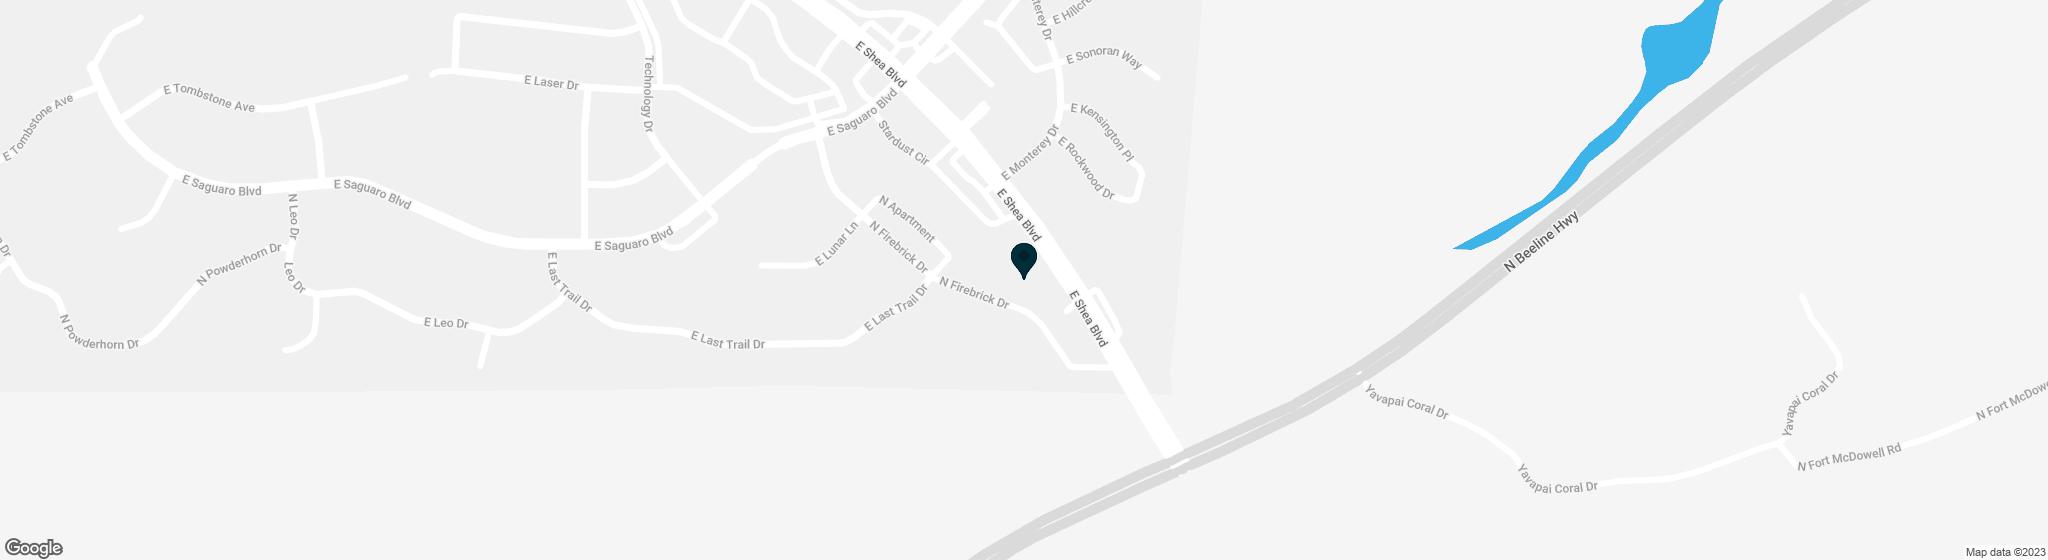 17205 E SHEA Boulevard #103 A Fountain Hills AZ 85268